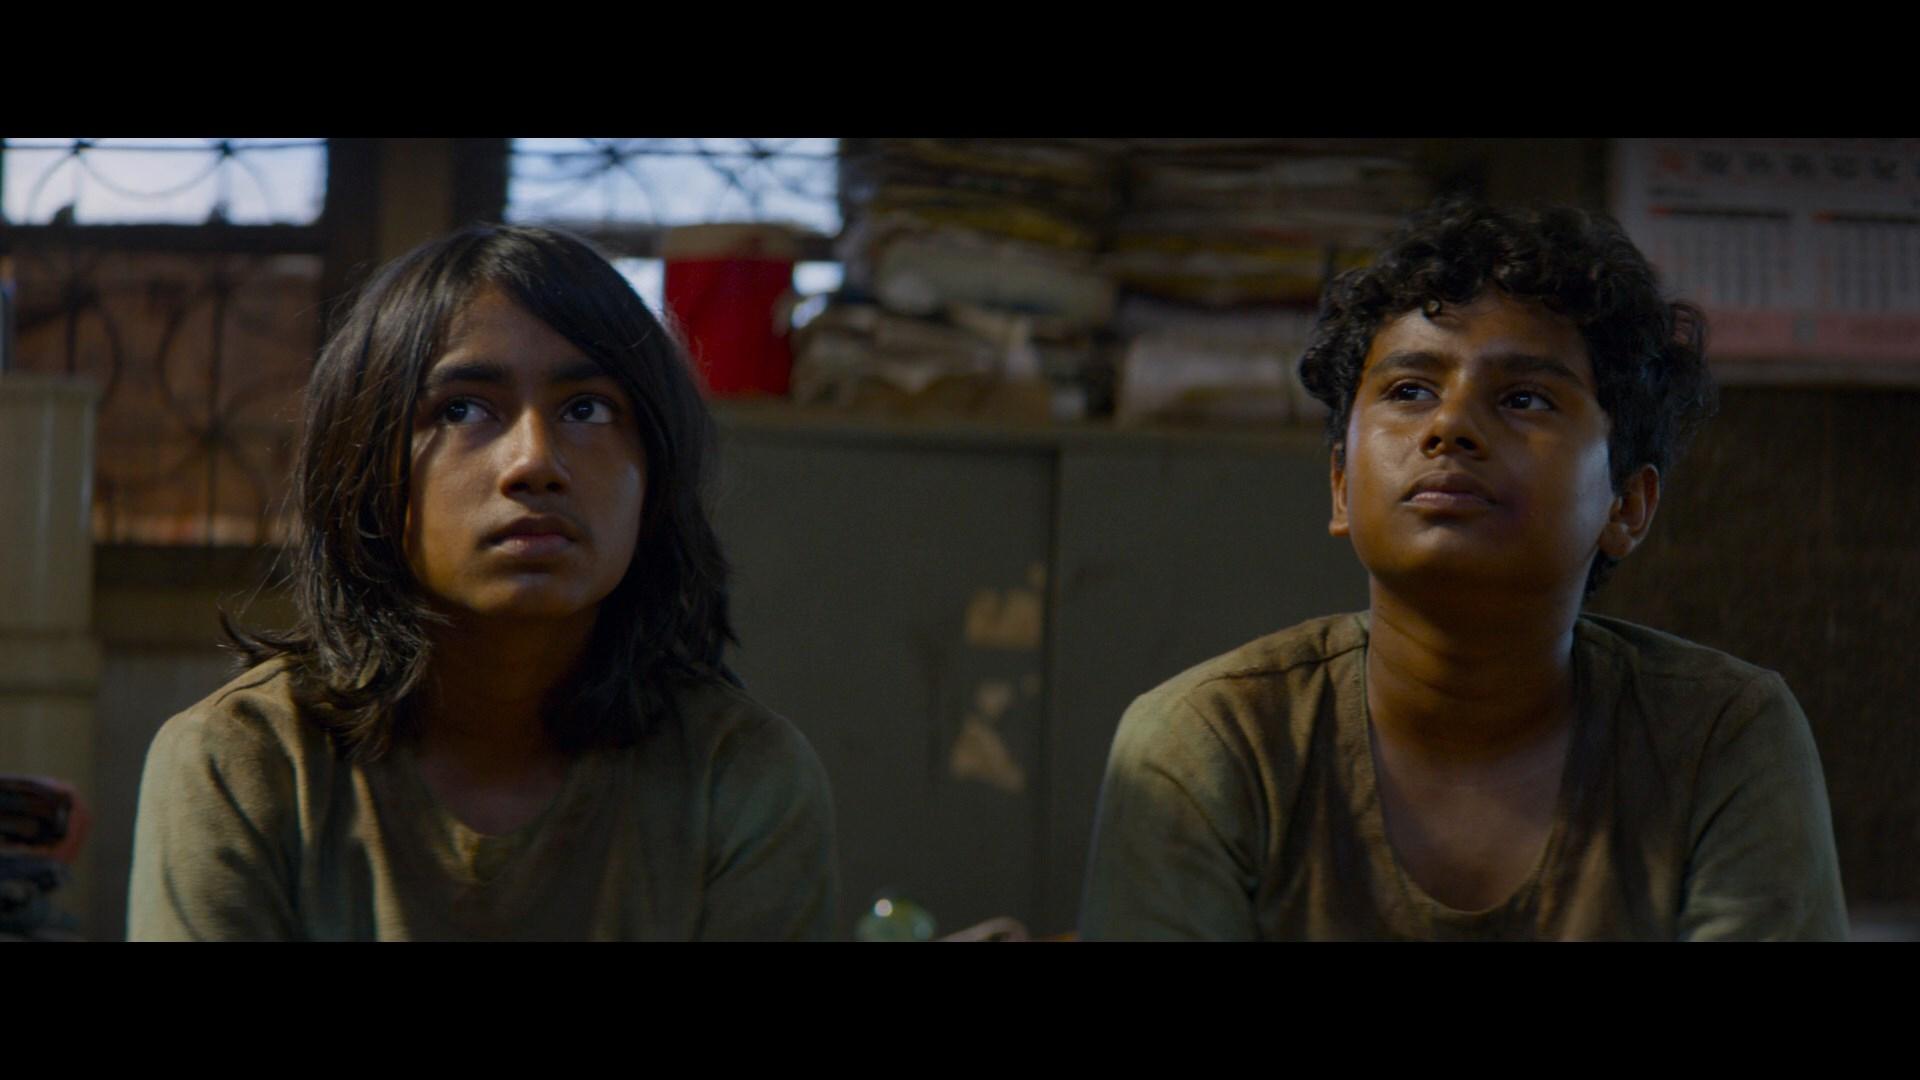 Un Millonario con Suerte (2018) 1080p BRRip Latino